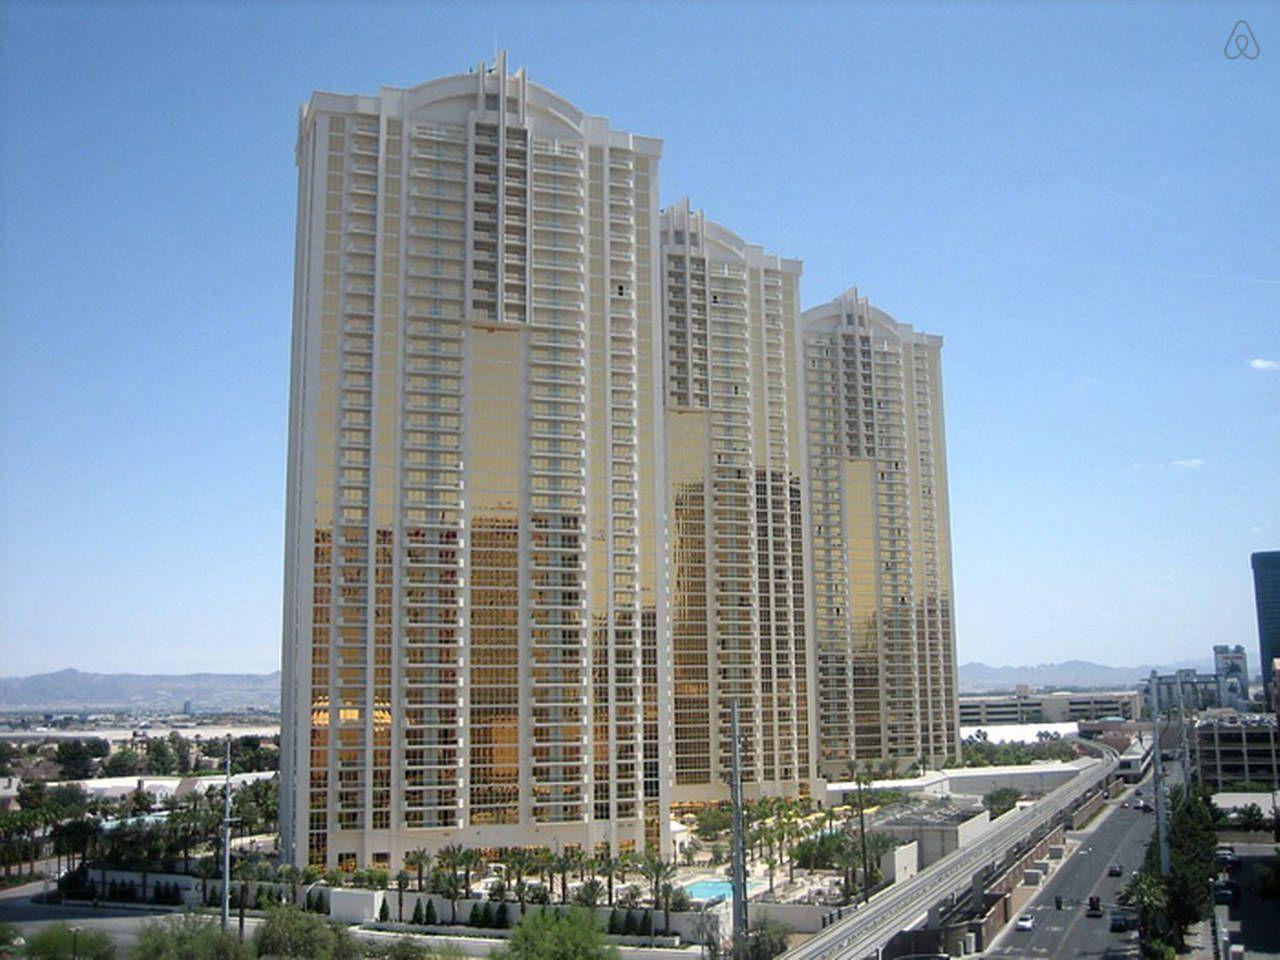 Top Floor Jr Suite W Strip View Mgm In Las Vegas Las Vegas Vacation Rentals Las Vegas Vacation Condo Vacation Rentals